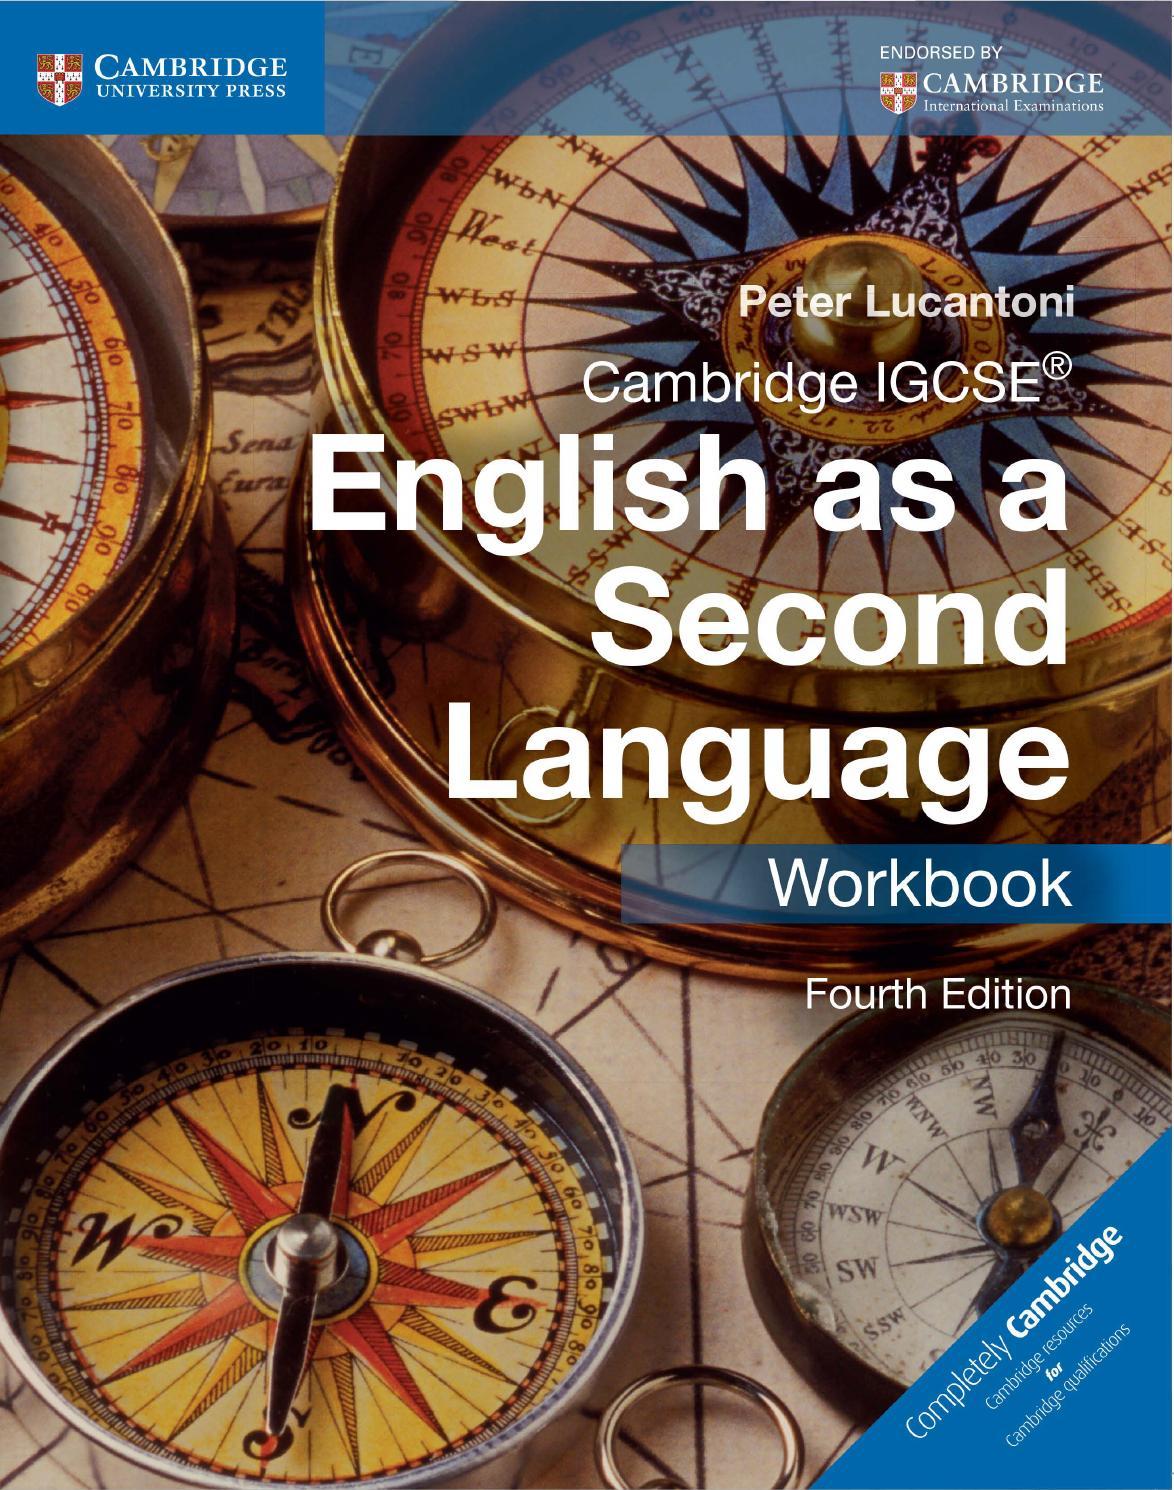 hight resolution of IGCSE English as a Second Language Workbook (fourth edition) by Cambridge  University Press Education - issuu